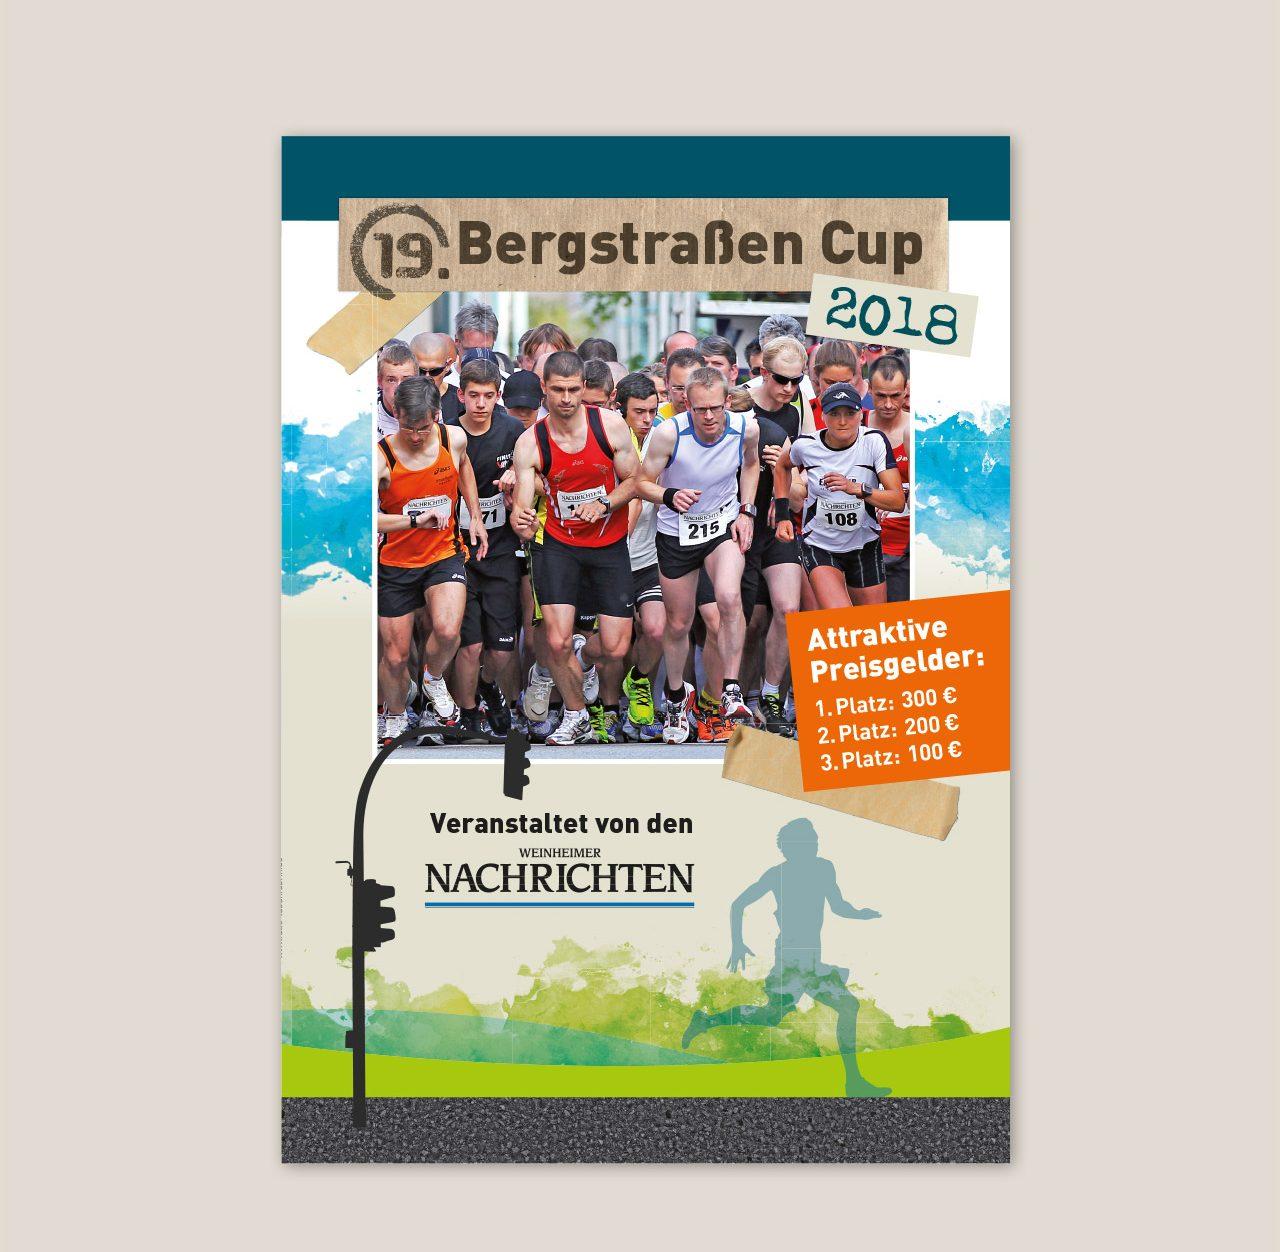 bergstrassen-cup_1280x1280